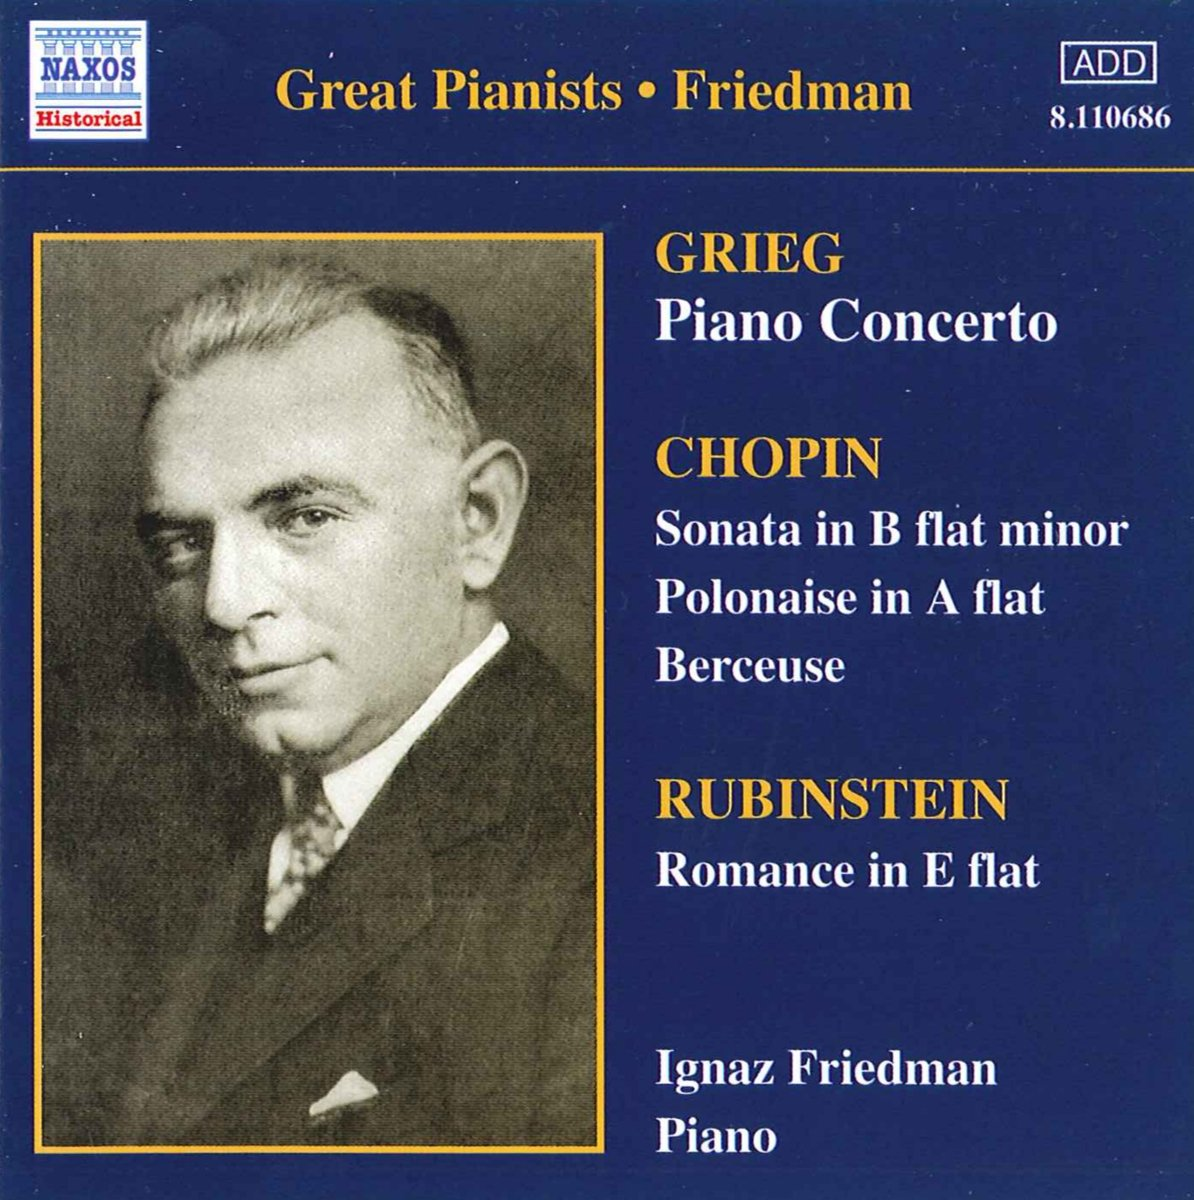 Friedman, Ignaz Complete Recordings, Volume 2 Vinyl